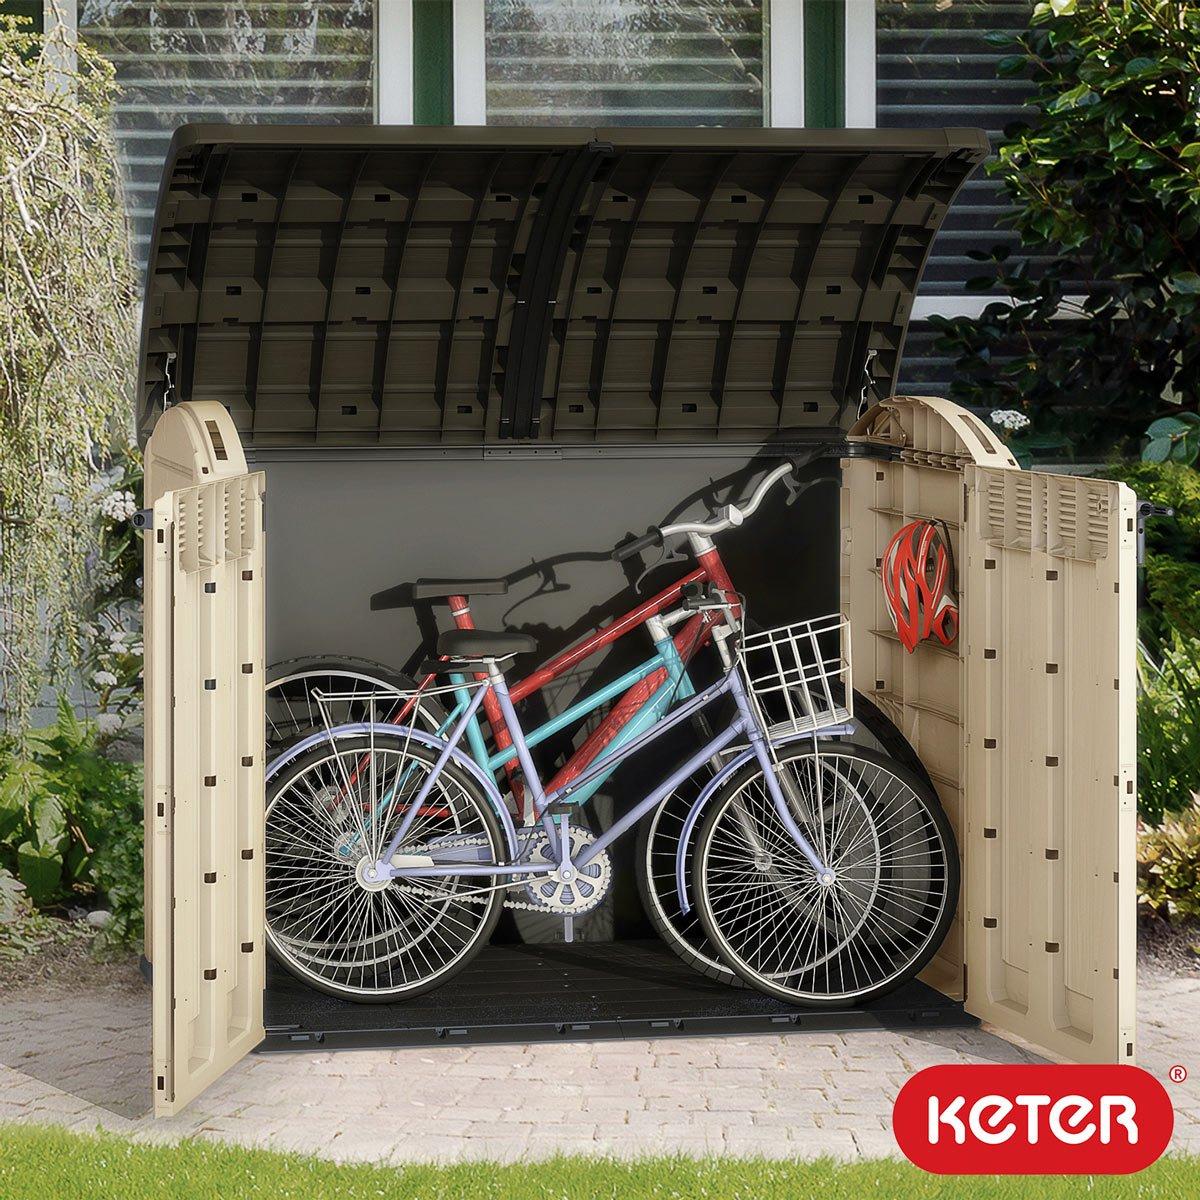 Keter 6016 Bike Und More Anthrazit Pro Bordi De